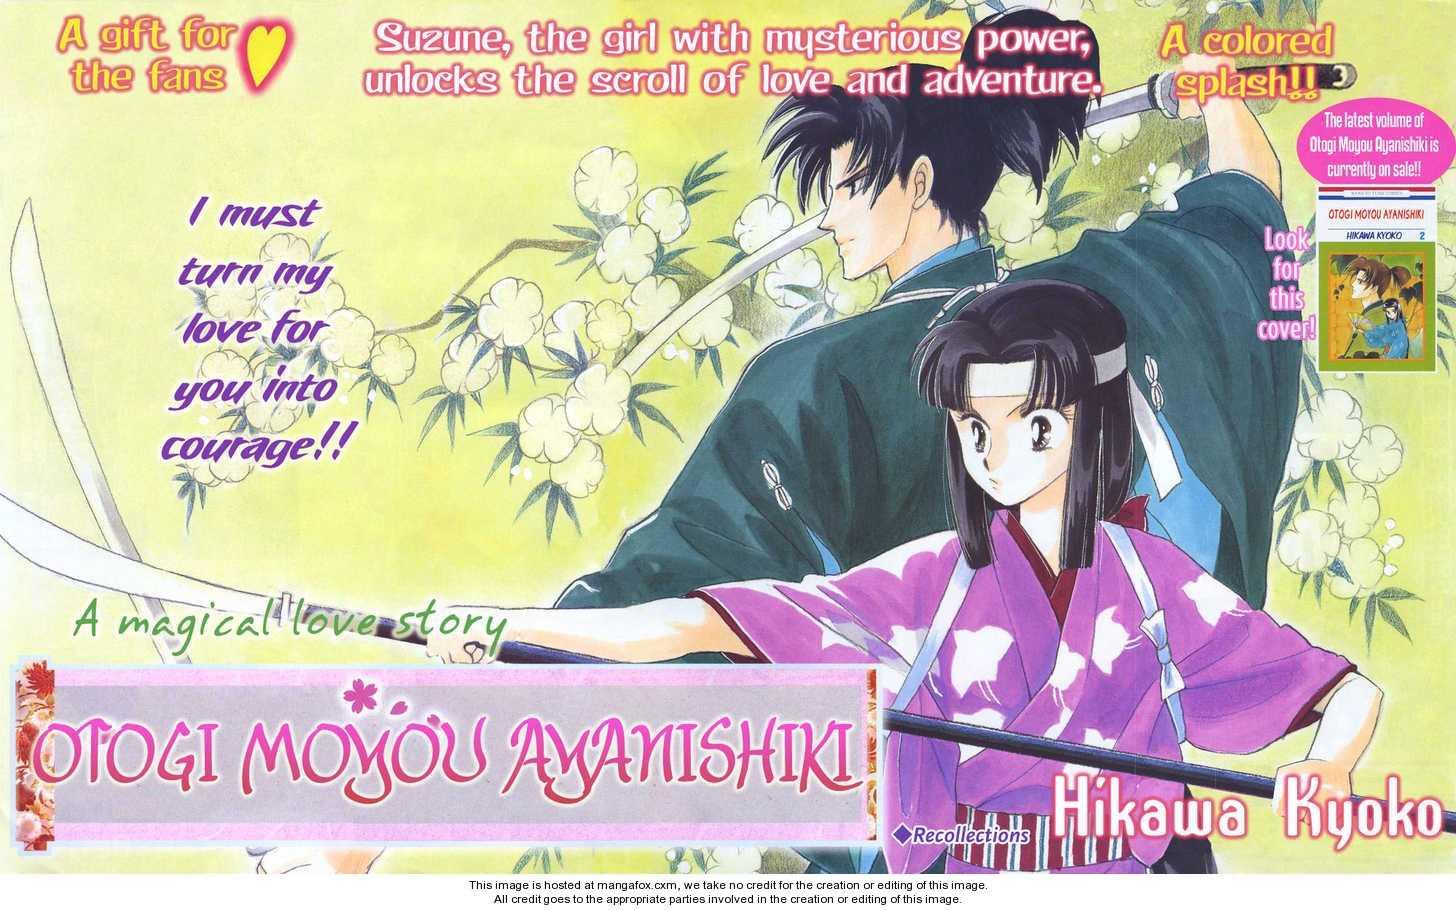 Otogi Moyou Ayanishiki 9 Page 1